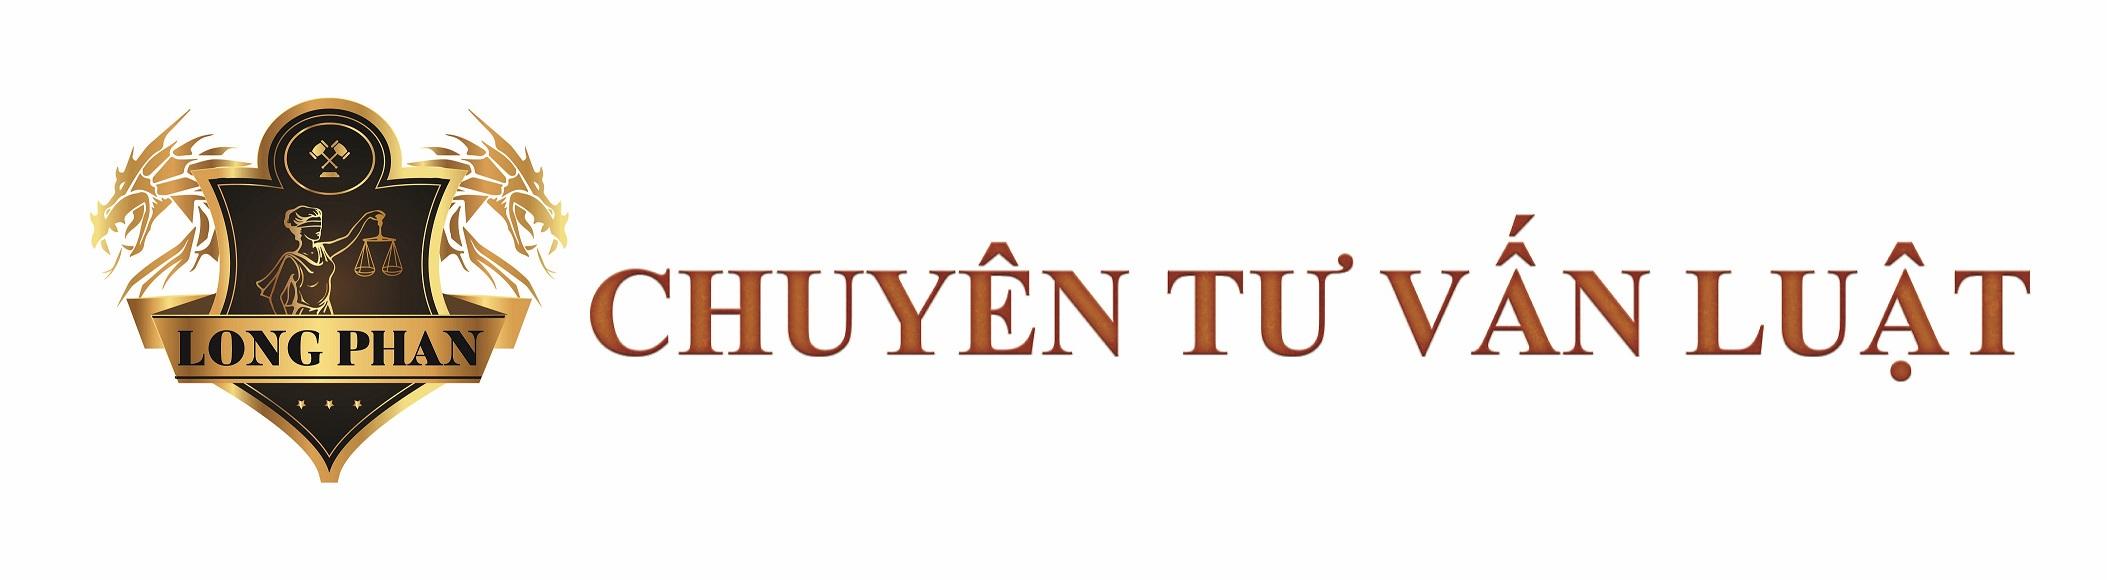 Chuyentuvanluat.com